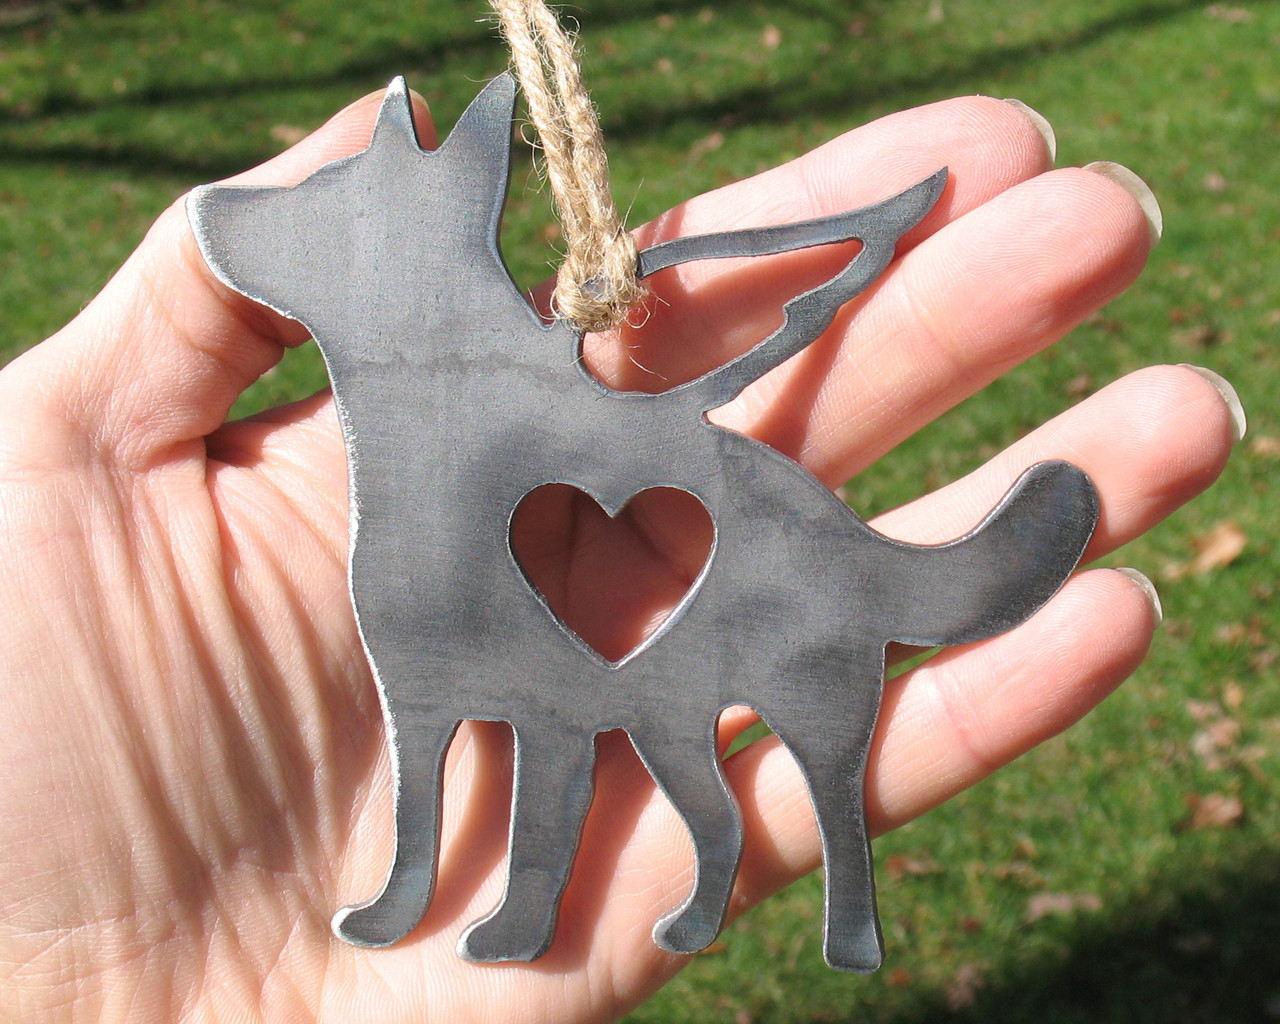 German Shepherd Dog Ornament 3 Pet Memorial W/ Angel Wings - Pet Loss Dog Sympathy Remembrance Gift - Metal Dog Christmas Ornament